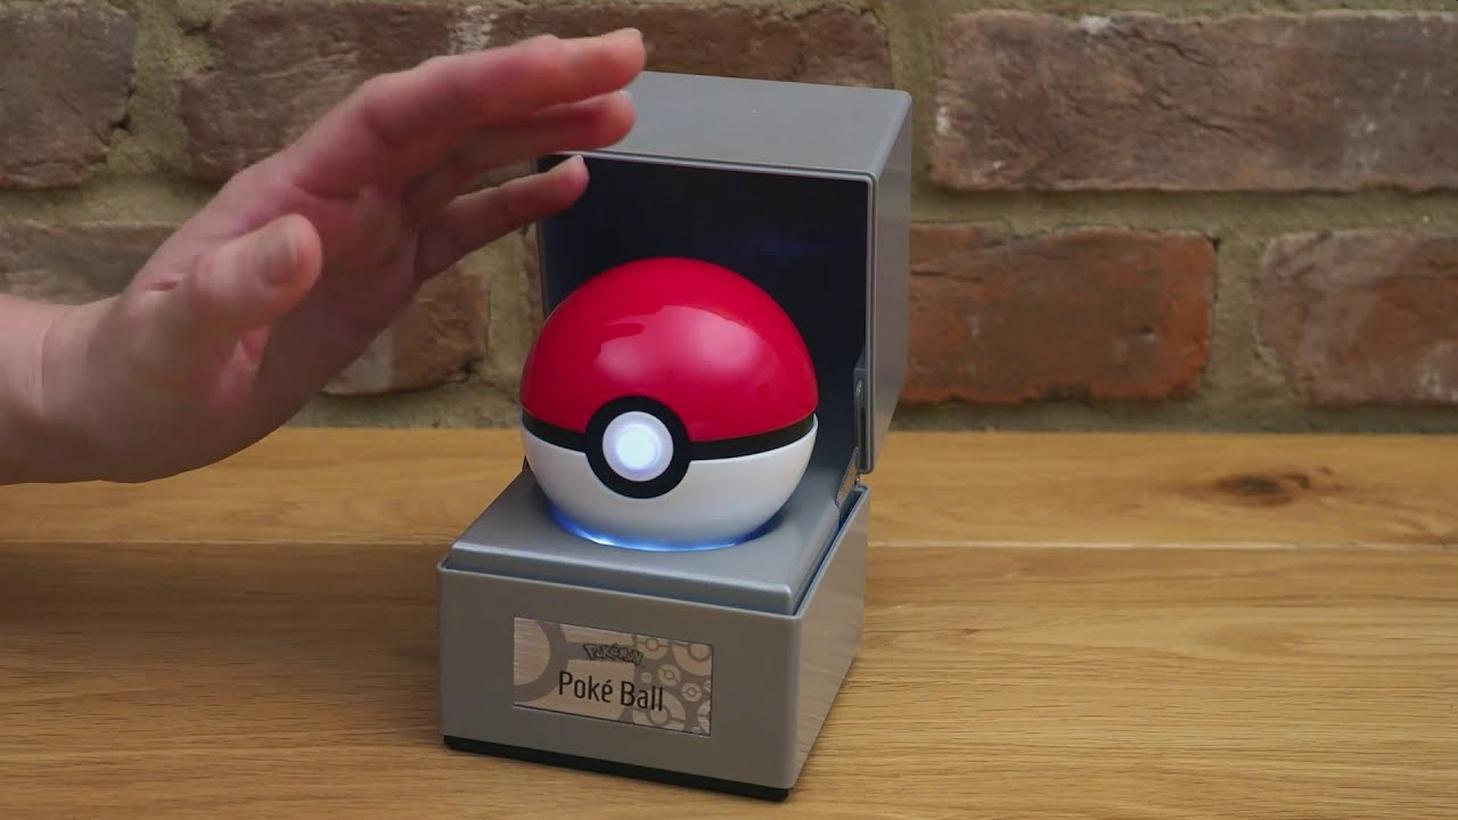 Pokémon Company And Wand Company Announce Premium Poké Ball Replica Collectible Series